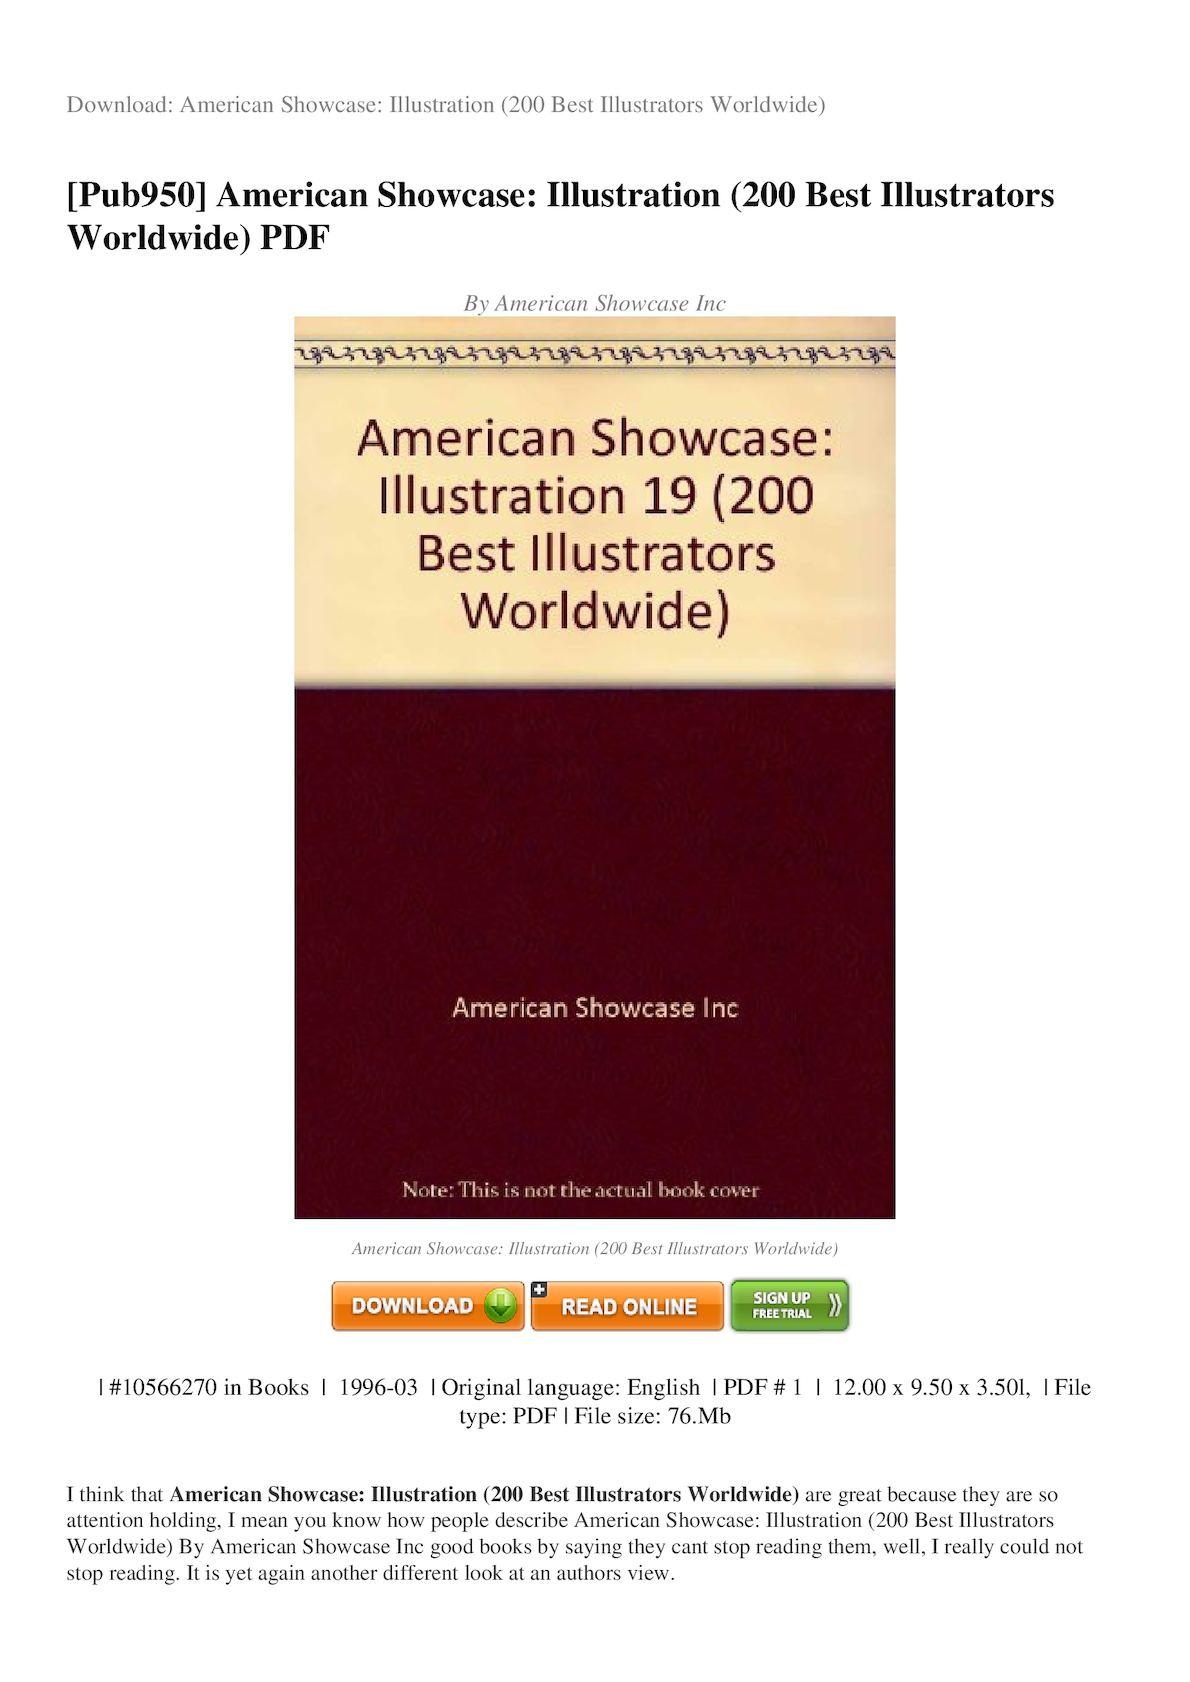 Calaméo - GET HERE AMERICAN SHOWCASE ILLUSTRATION 200 BEST